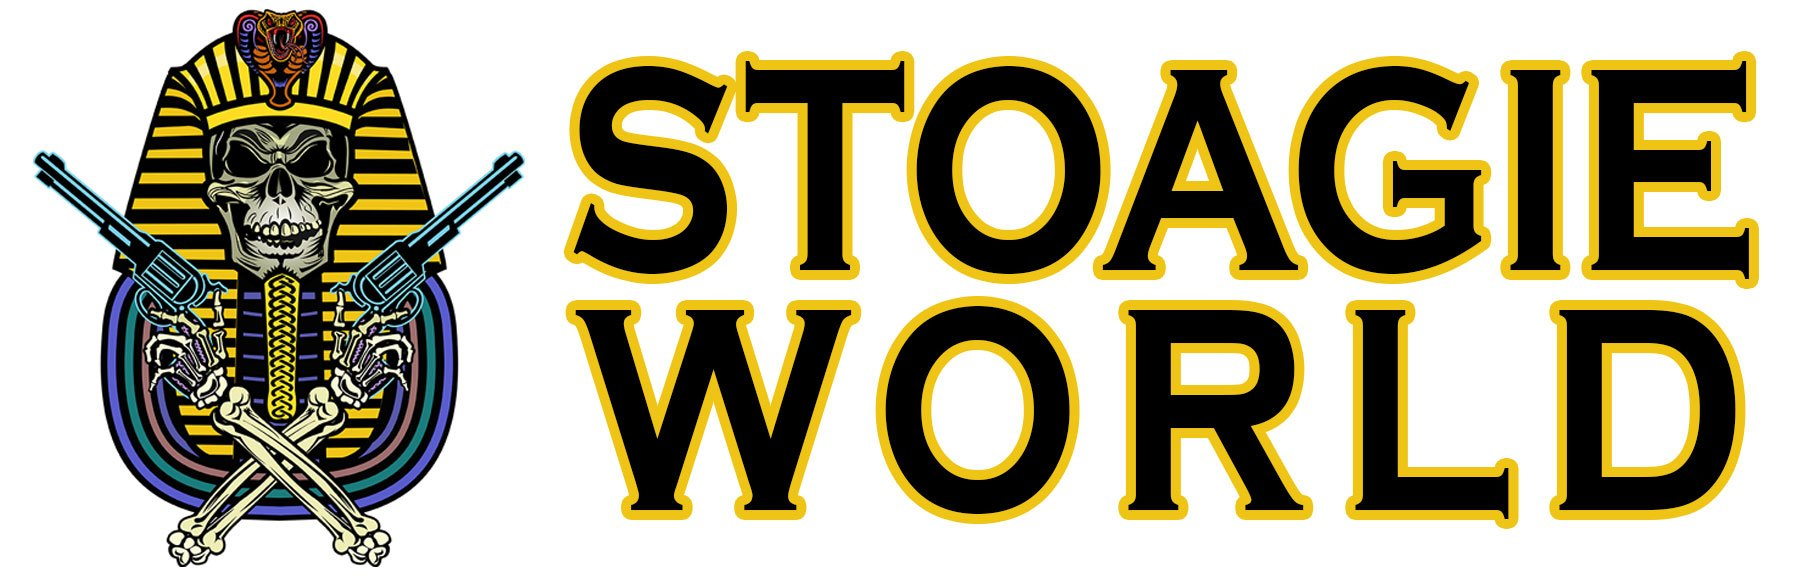 stoagieworld.com